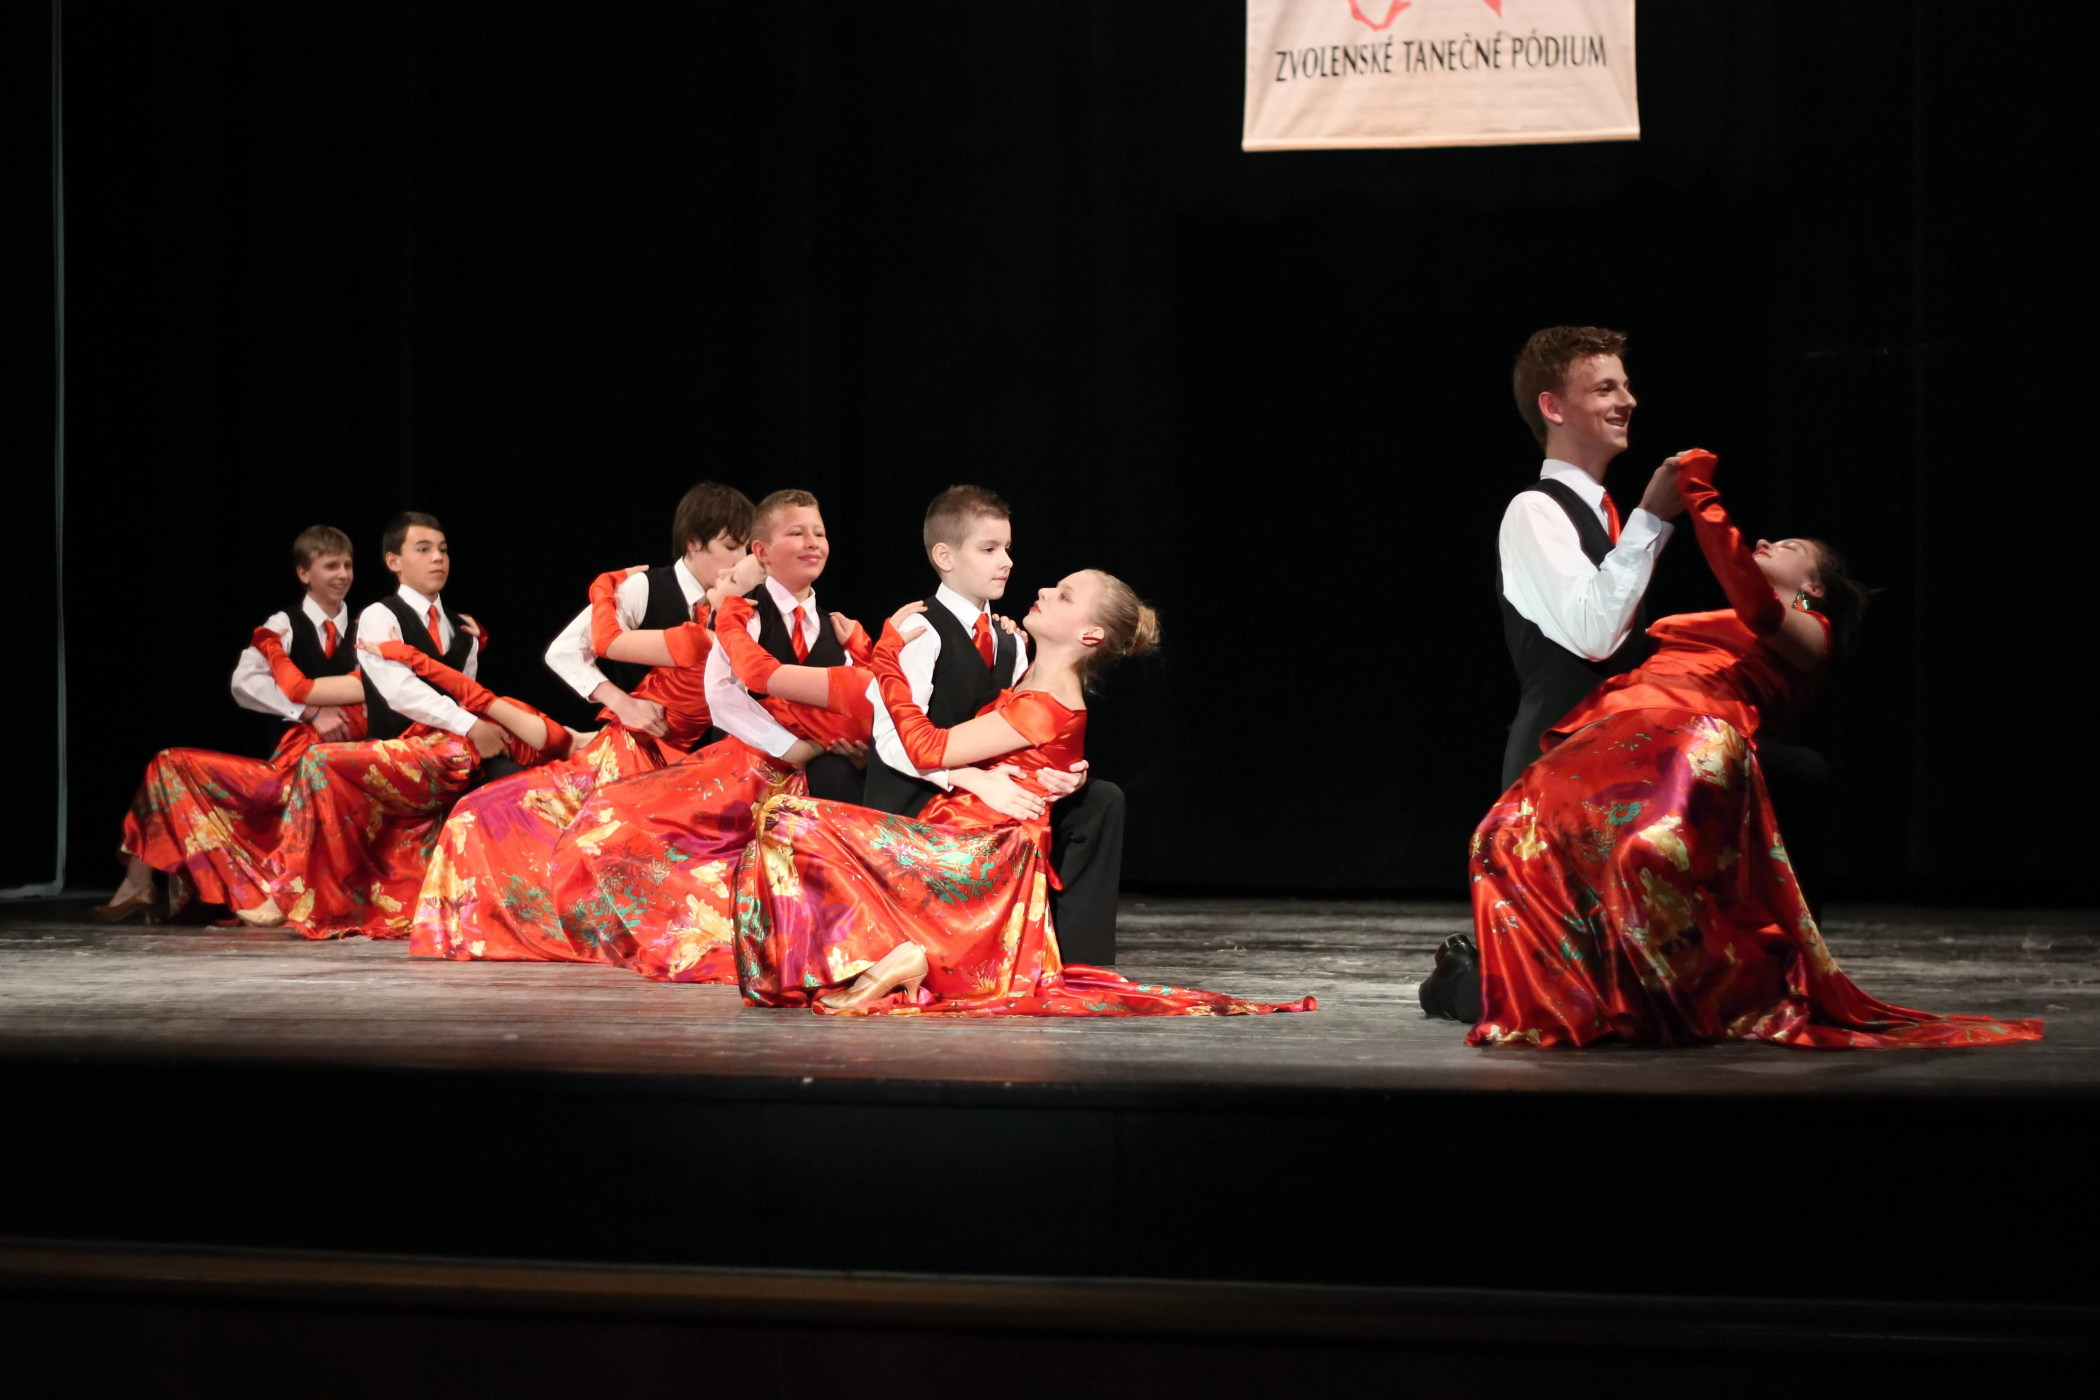 zvolenske-tanecne-podium-22